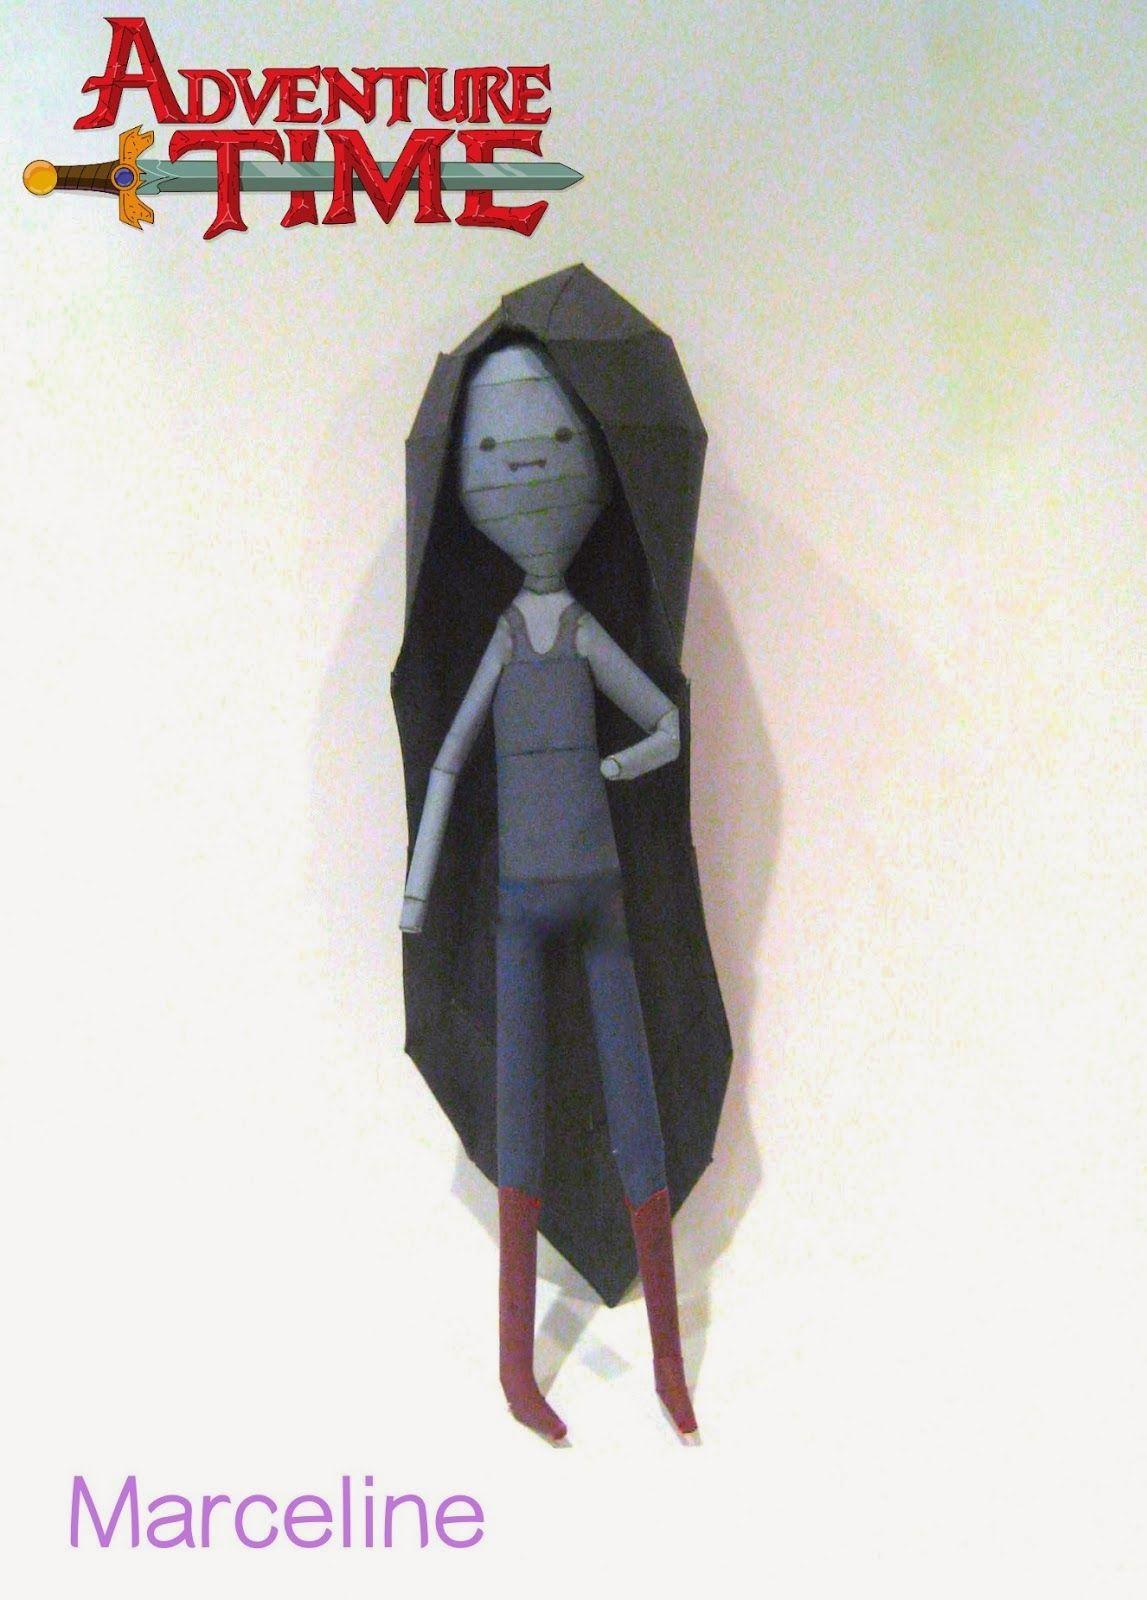 Papercraft Adventure Time Marceline The Vampire Queen Papercraft4u